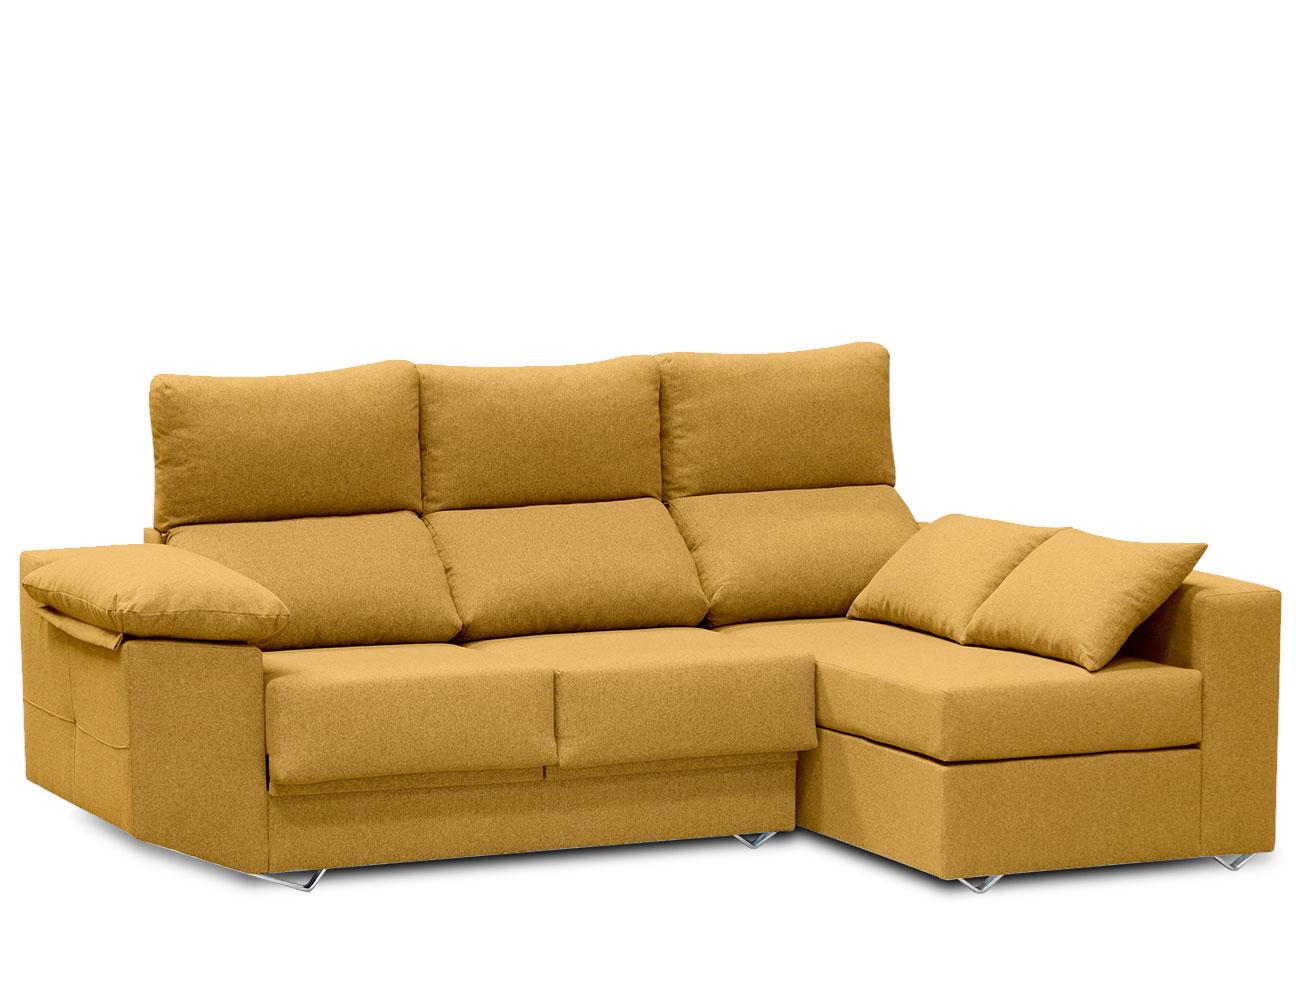 Sofa chaiselongue moderno mostaza 2